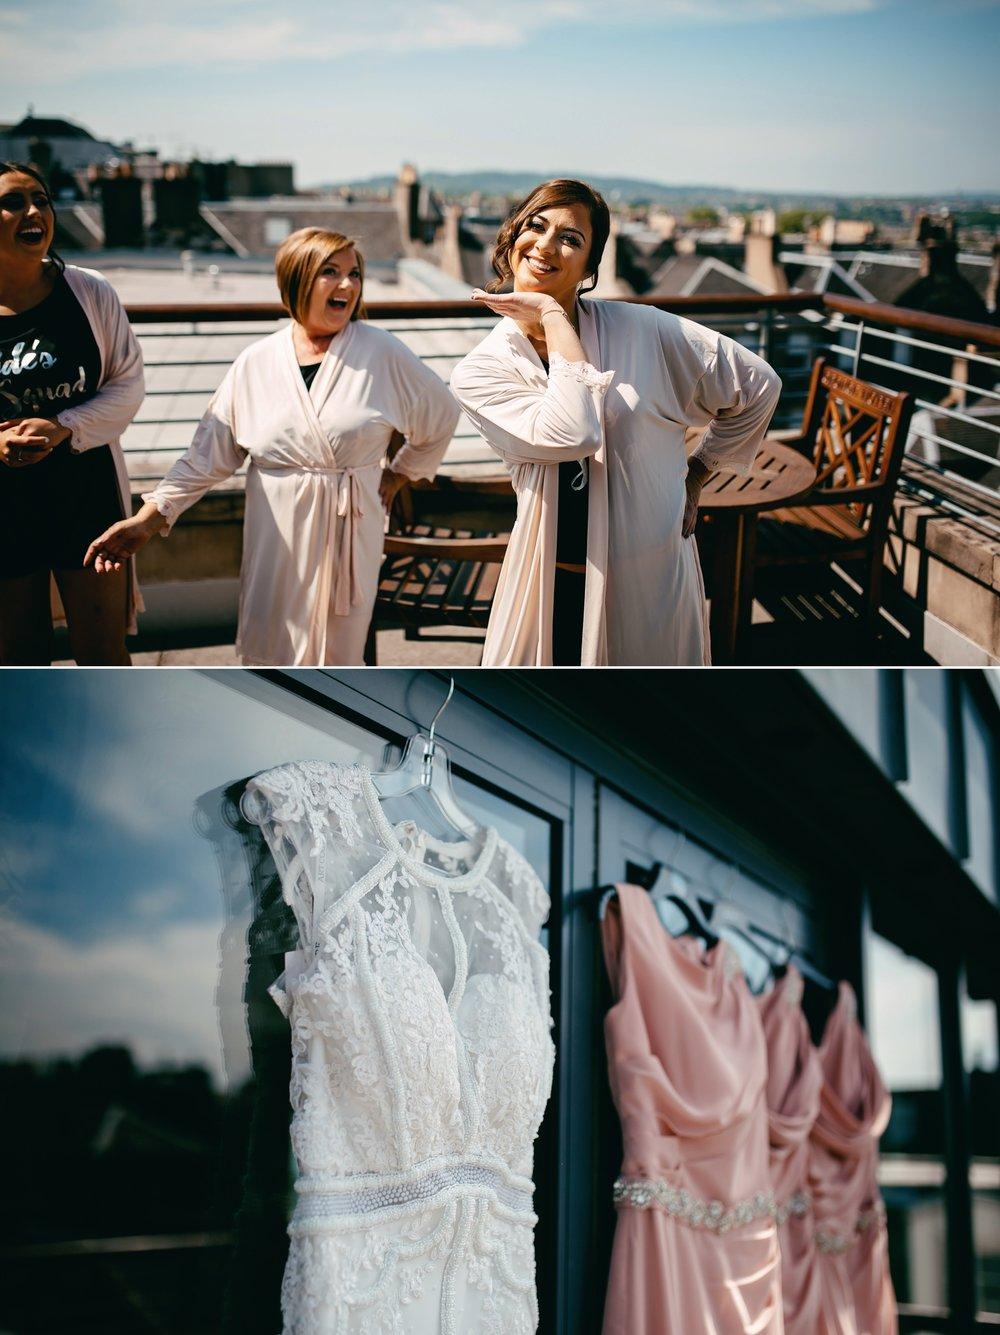 011-Carla-Dexter-The-Principal-Hotel-George-St-Edinburgh.jpg